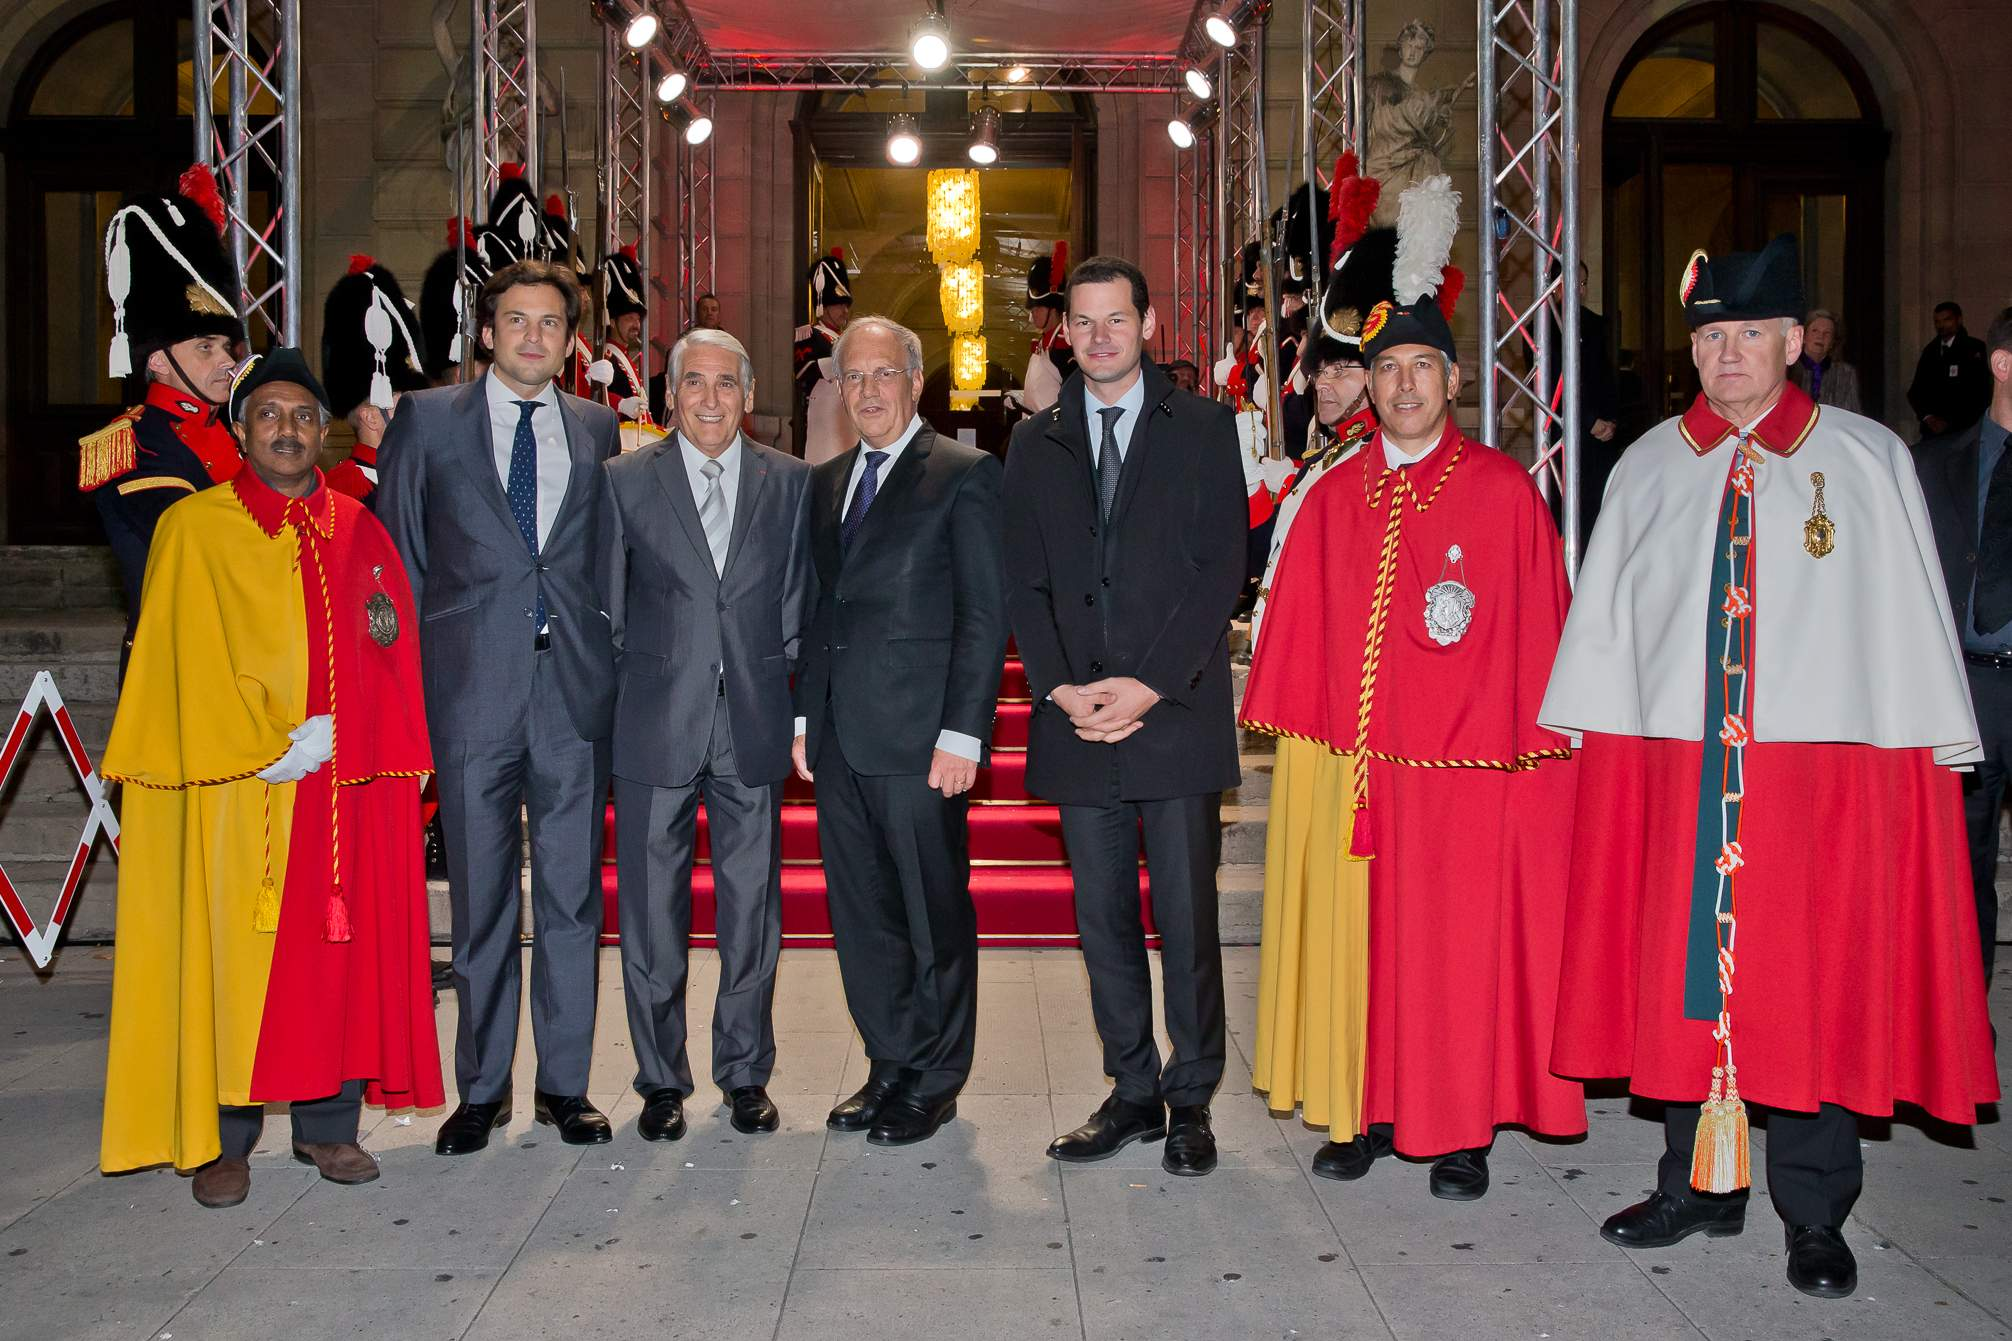 Guillaume Barazzone (Conseiller national et conseiller administratif de la Ville de Genève), Carlo Lamprecht (Président de la Fondation du GPHG), Johann Schneider-Ammann (Conseiller fédéral), Pierre Maudet (Conseiller d'Etat)